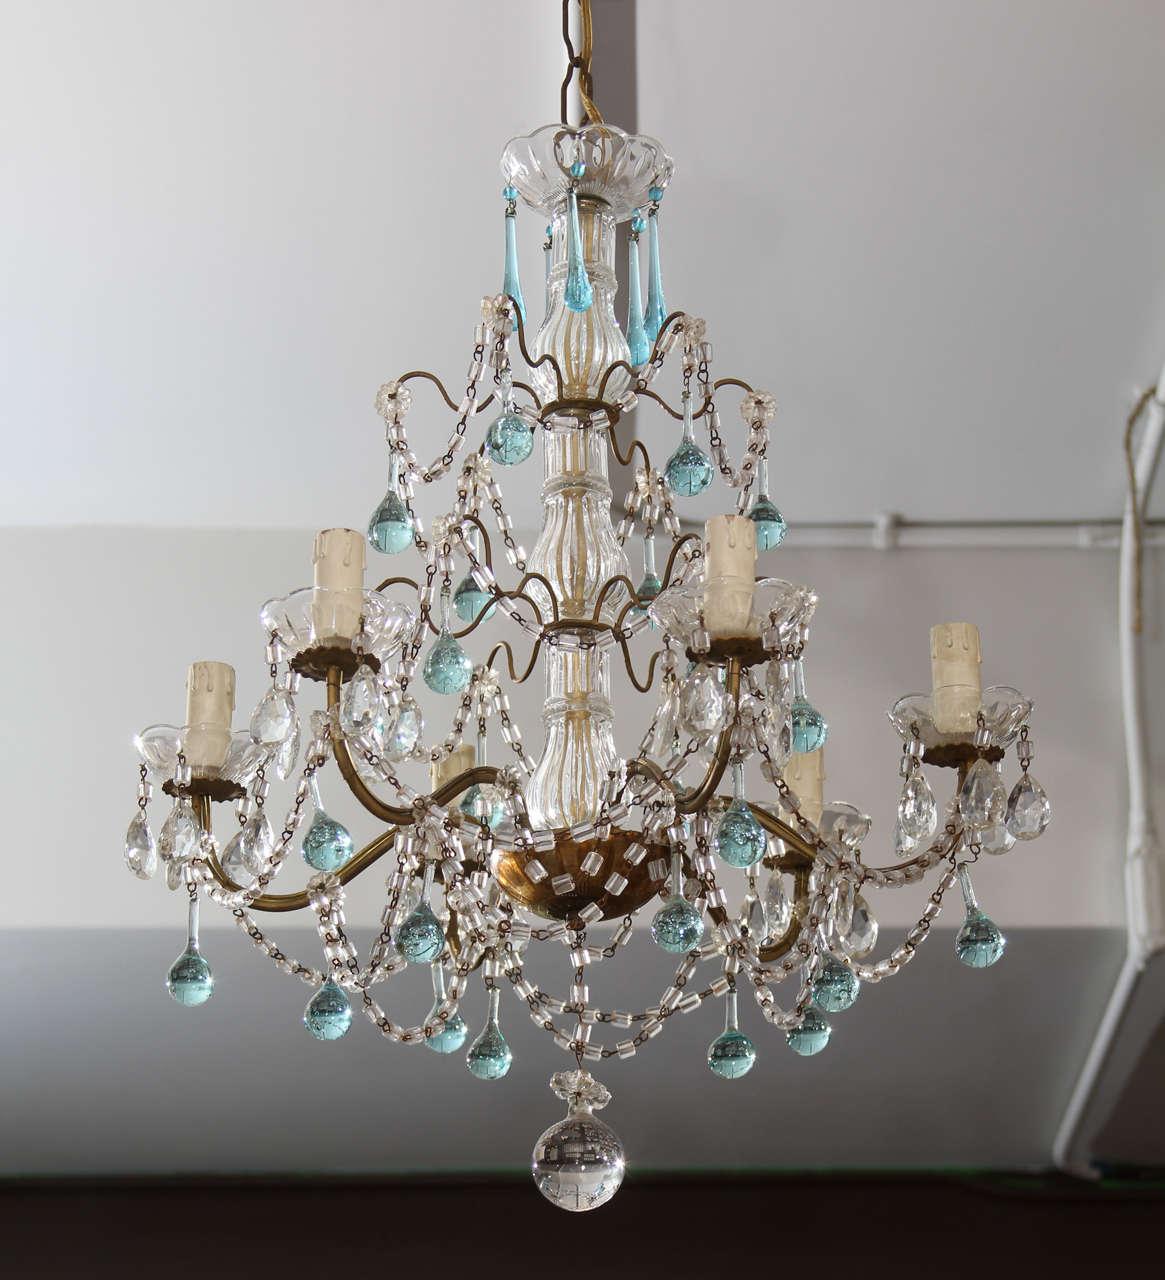 Very pretty six-arm glass chandelier with sea blue glass drops.